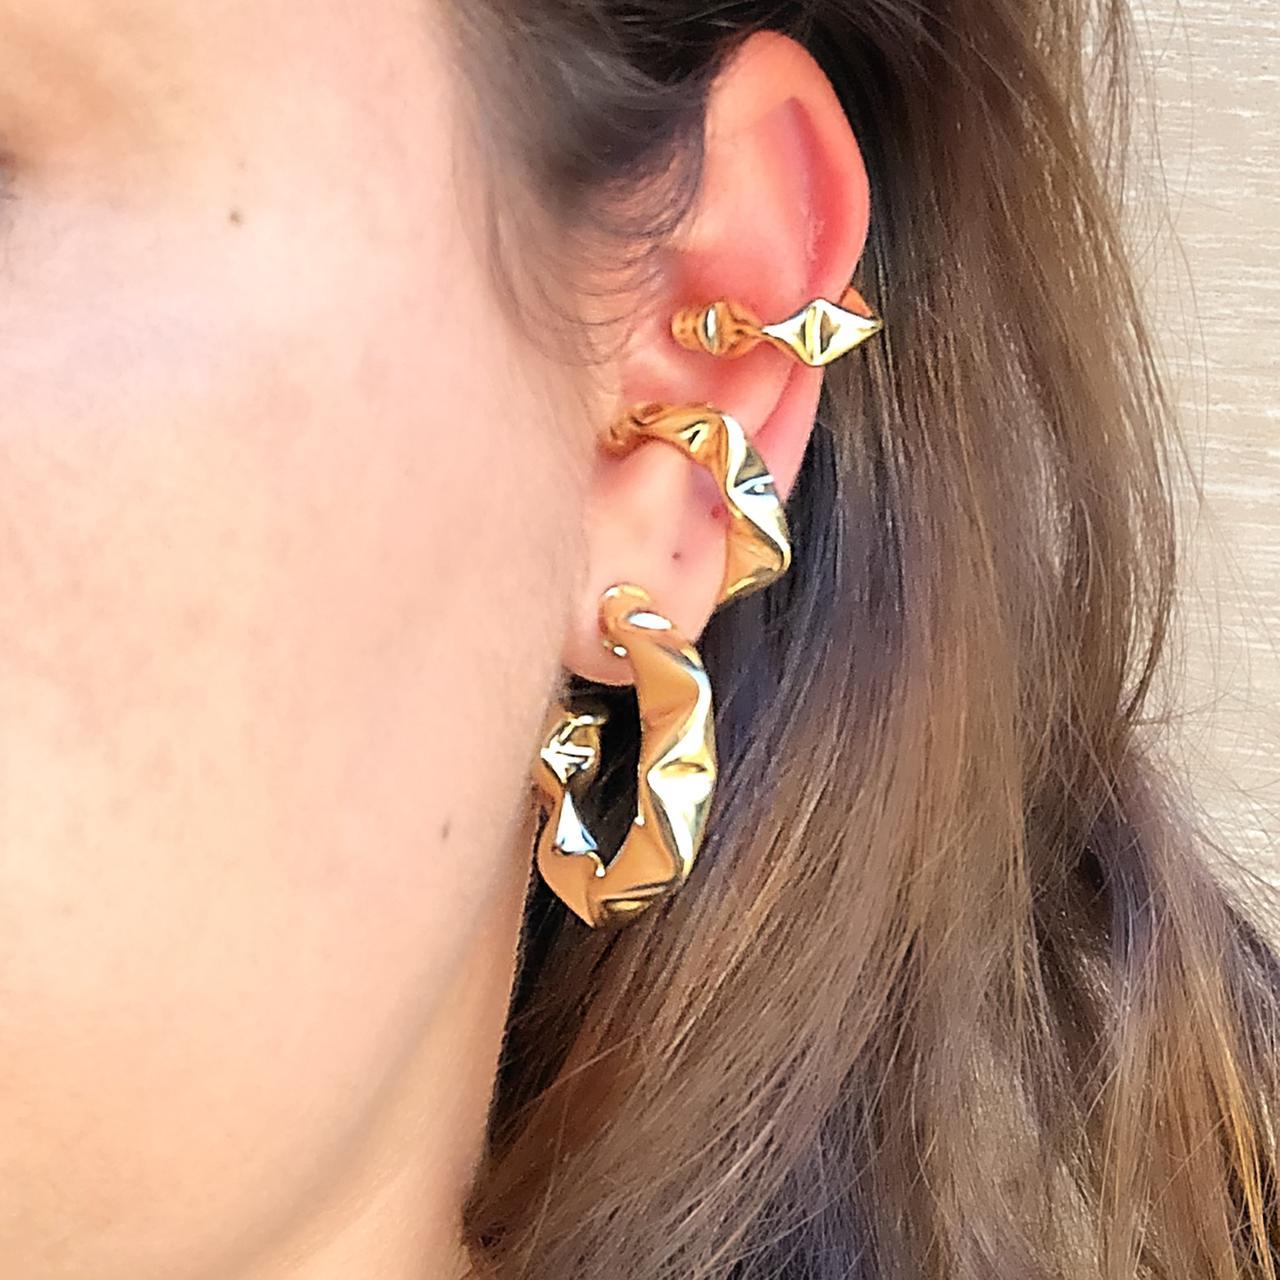 Conjunto 2 Piercing Juliette de Encaixe Torcido Dourado Banho Ouro 18K